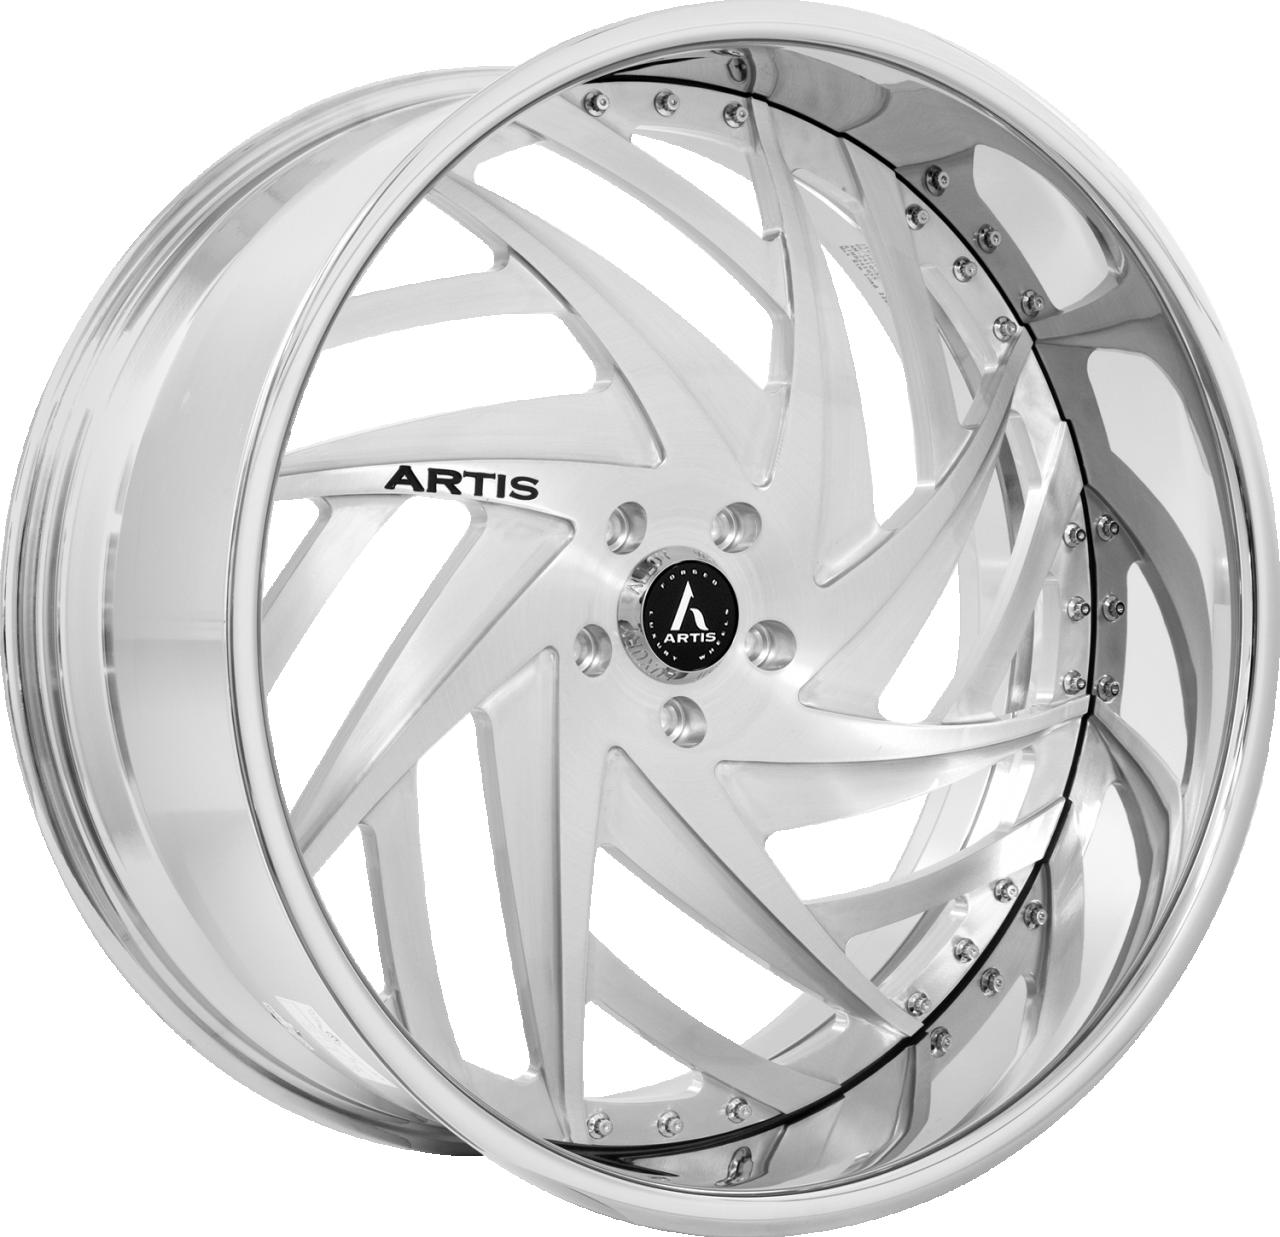 Artis Forged Bronx wheel with Brushed finish